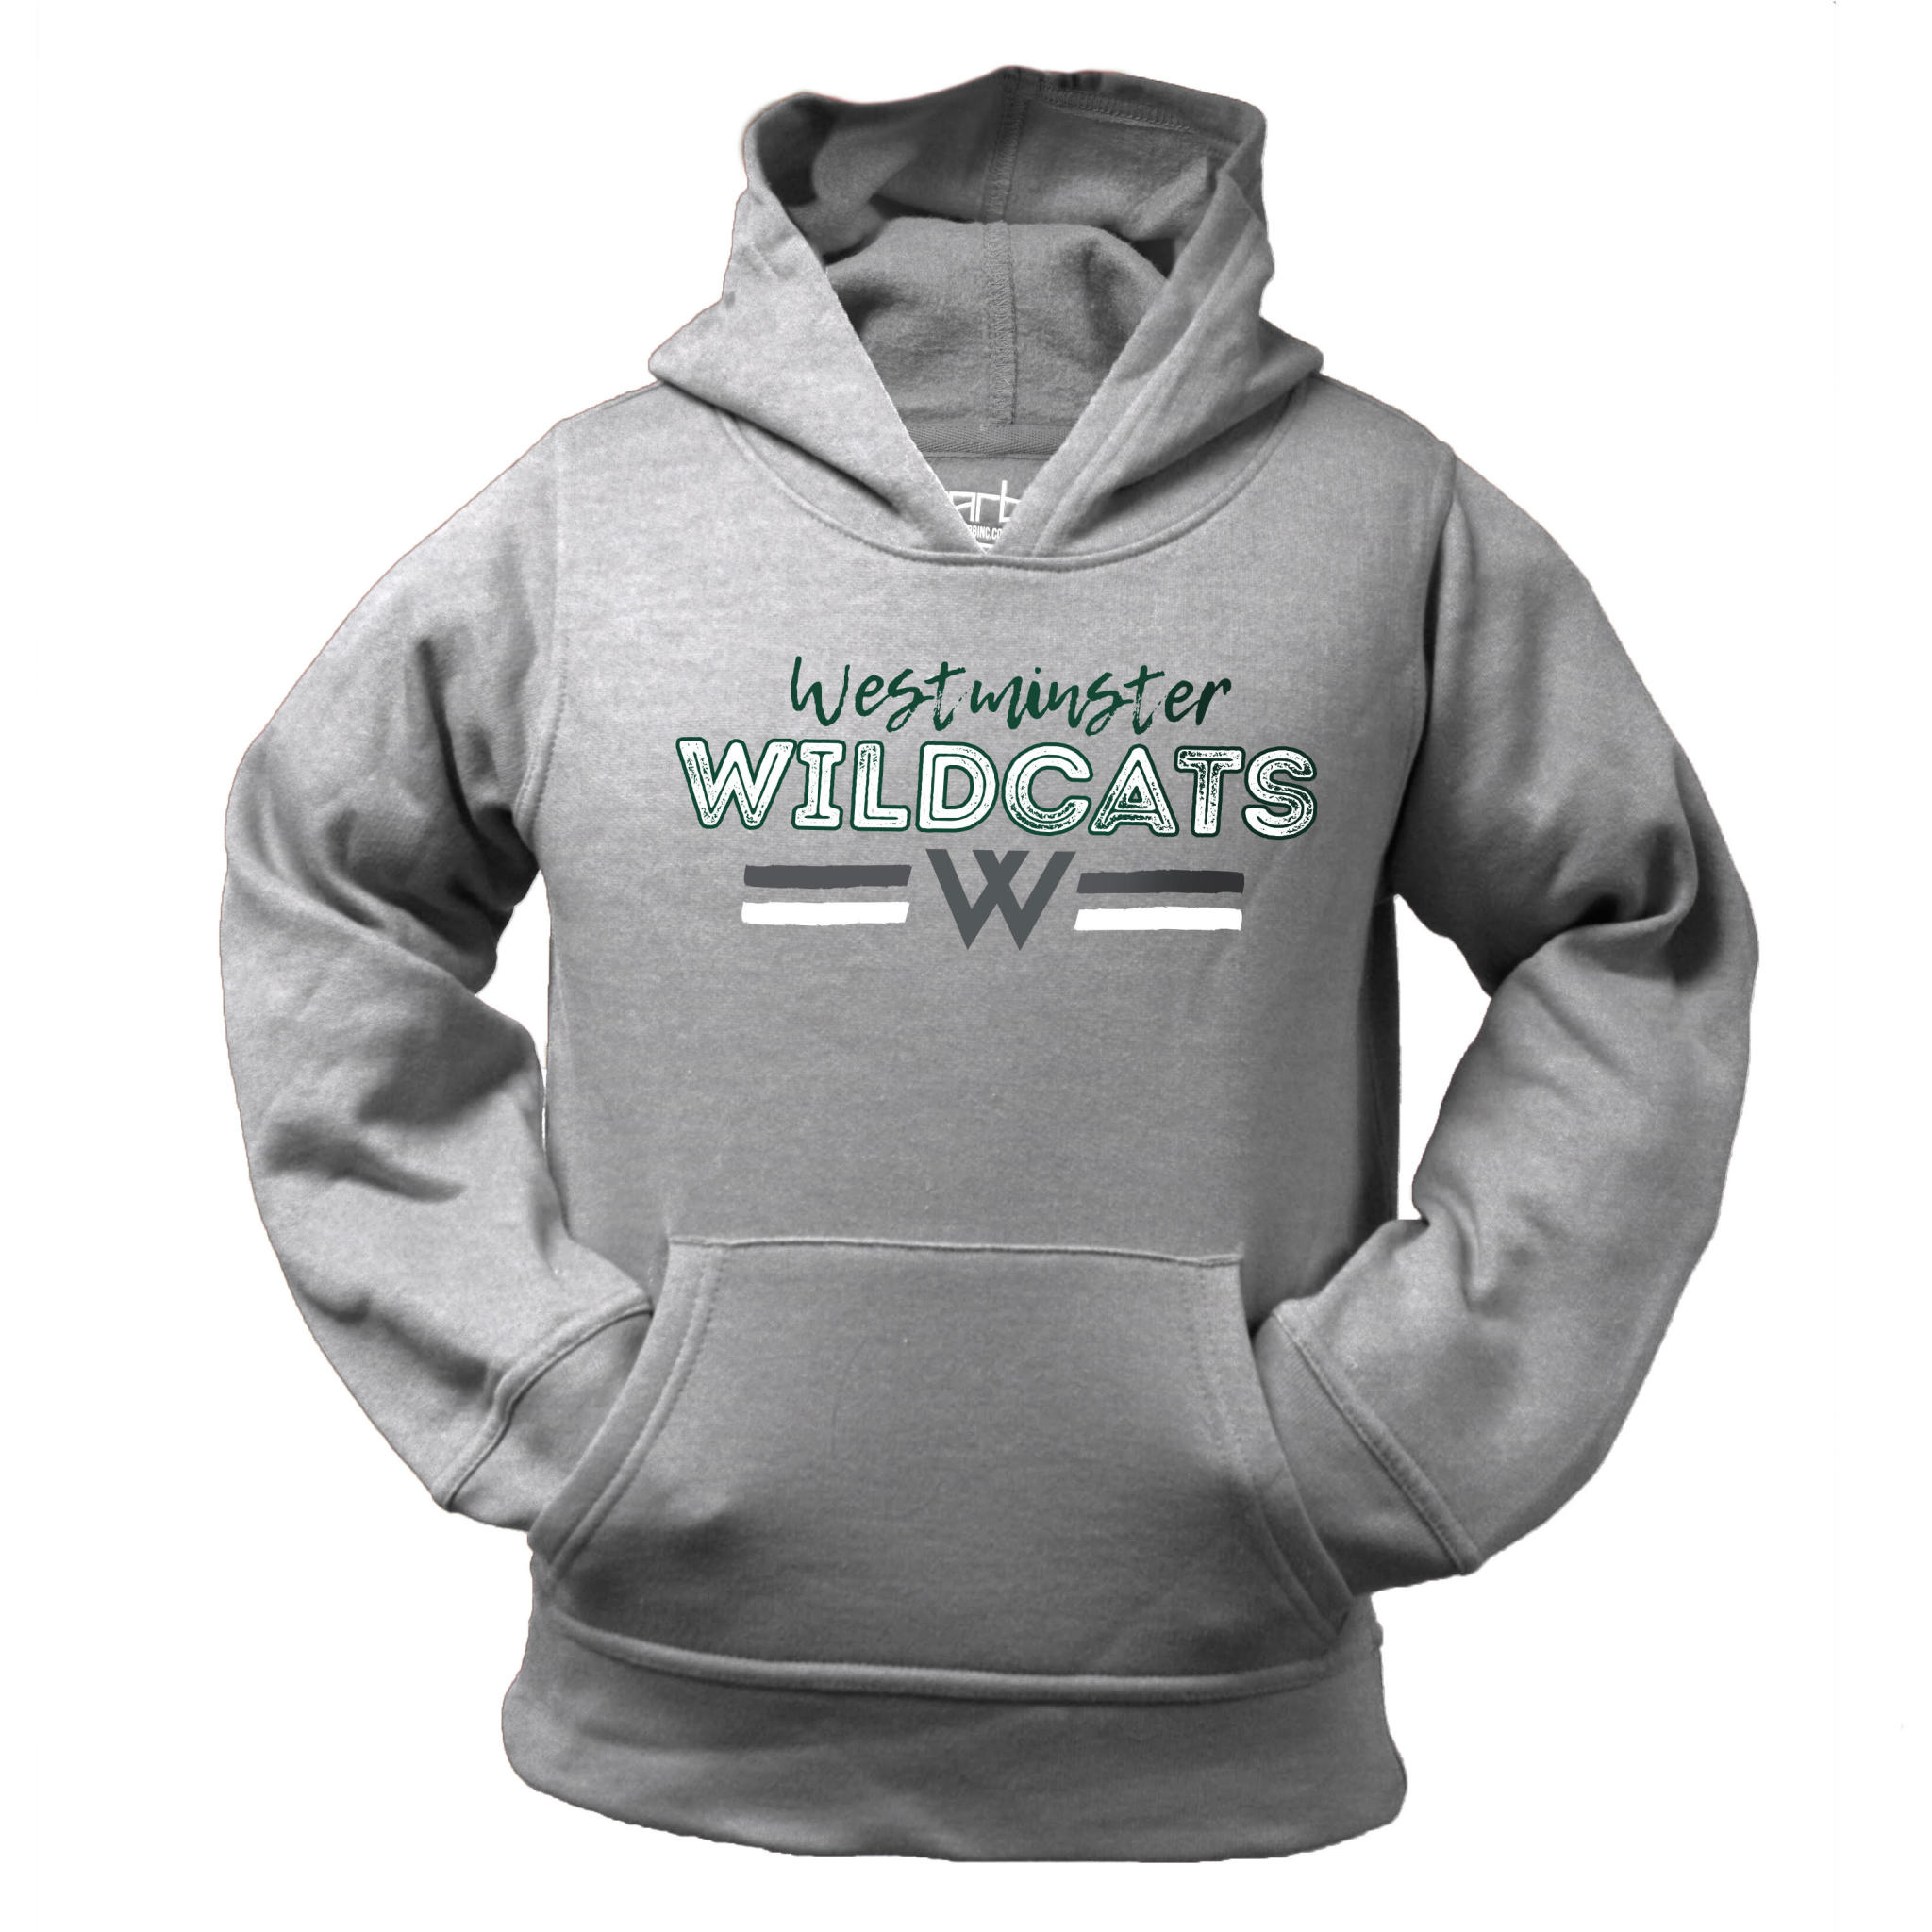 Sweatshirt: Garb Parker Hoody Gray